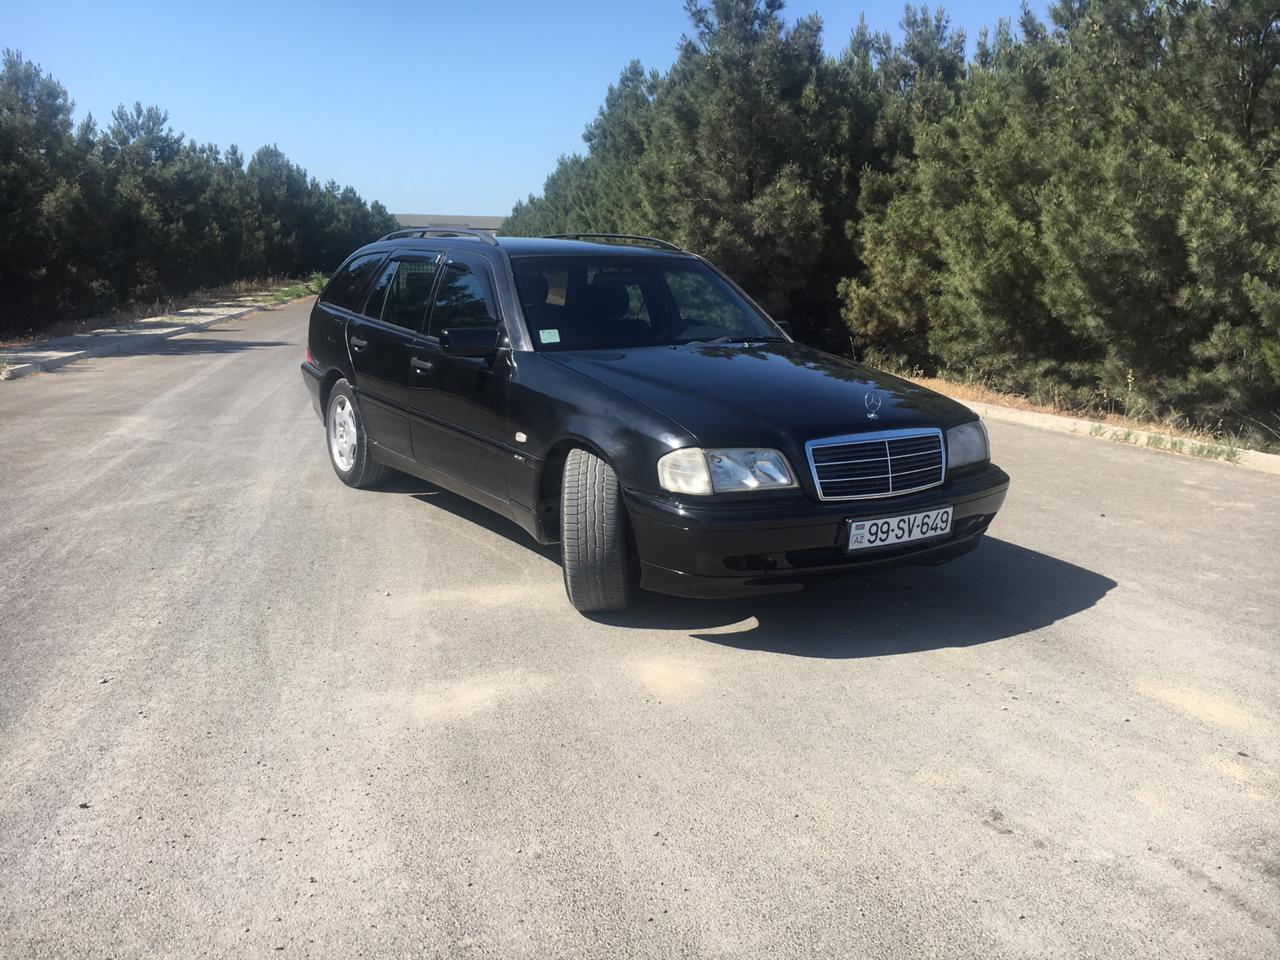 Mercedes-Benz C 180 1.8(lt) 1999 İkinci əl  $9800